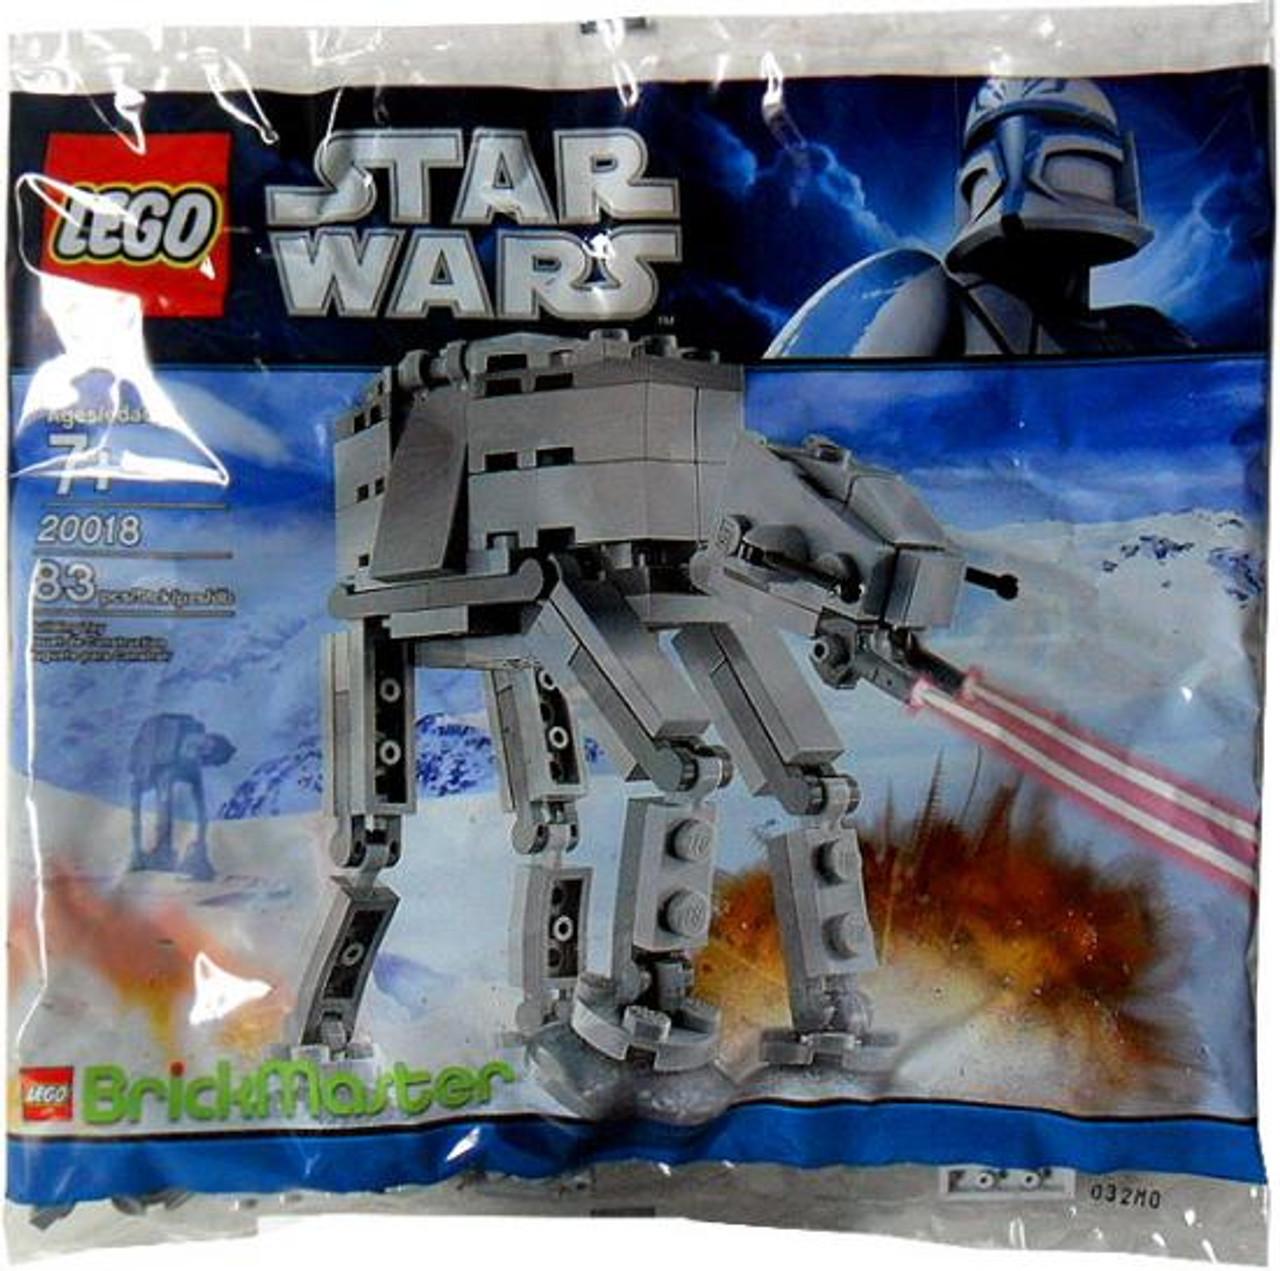 LEGO Star Wars BrickMaster Mini AT-AT Exclusive Mini Set #20018 [Bagged]